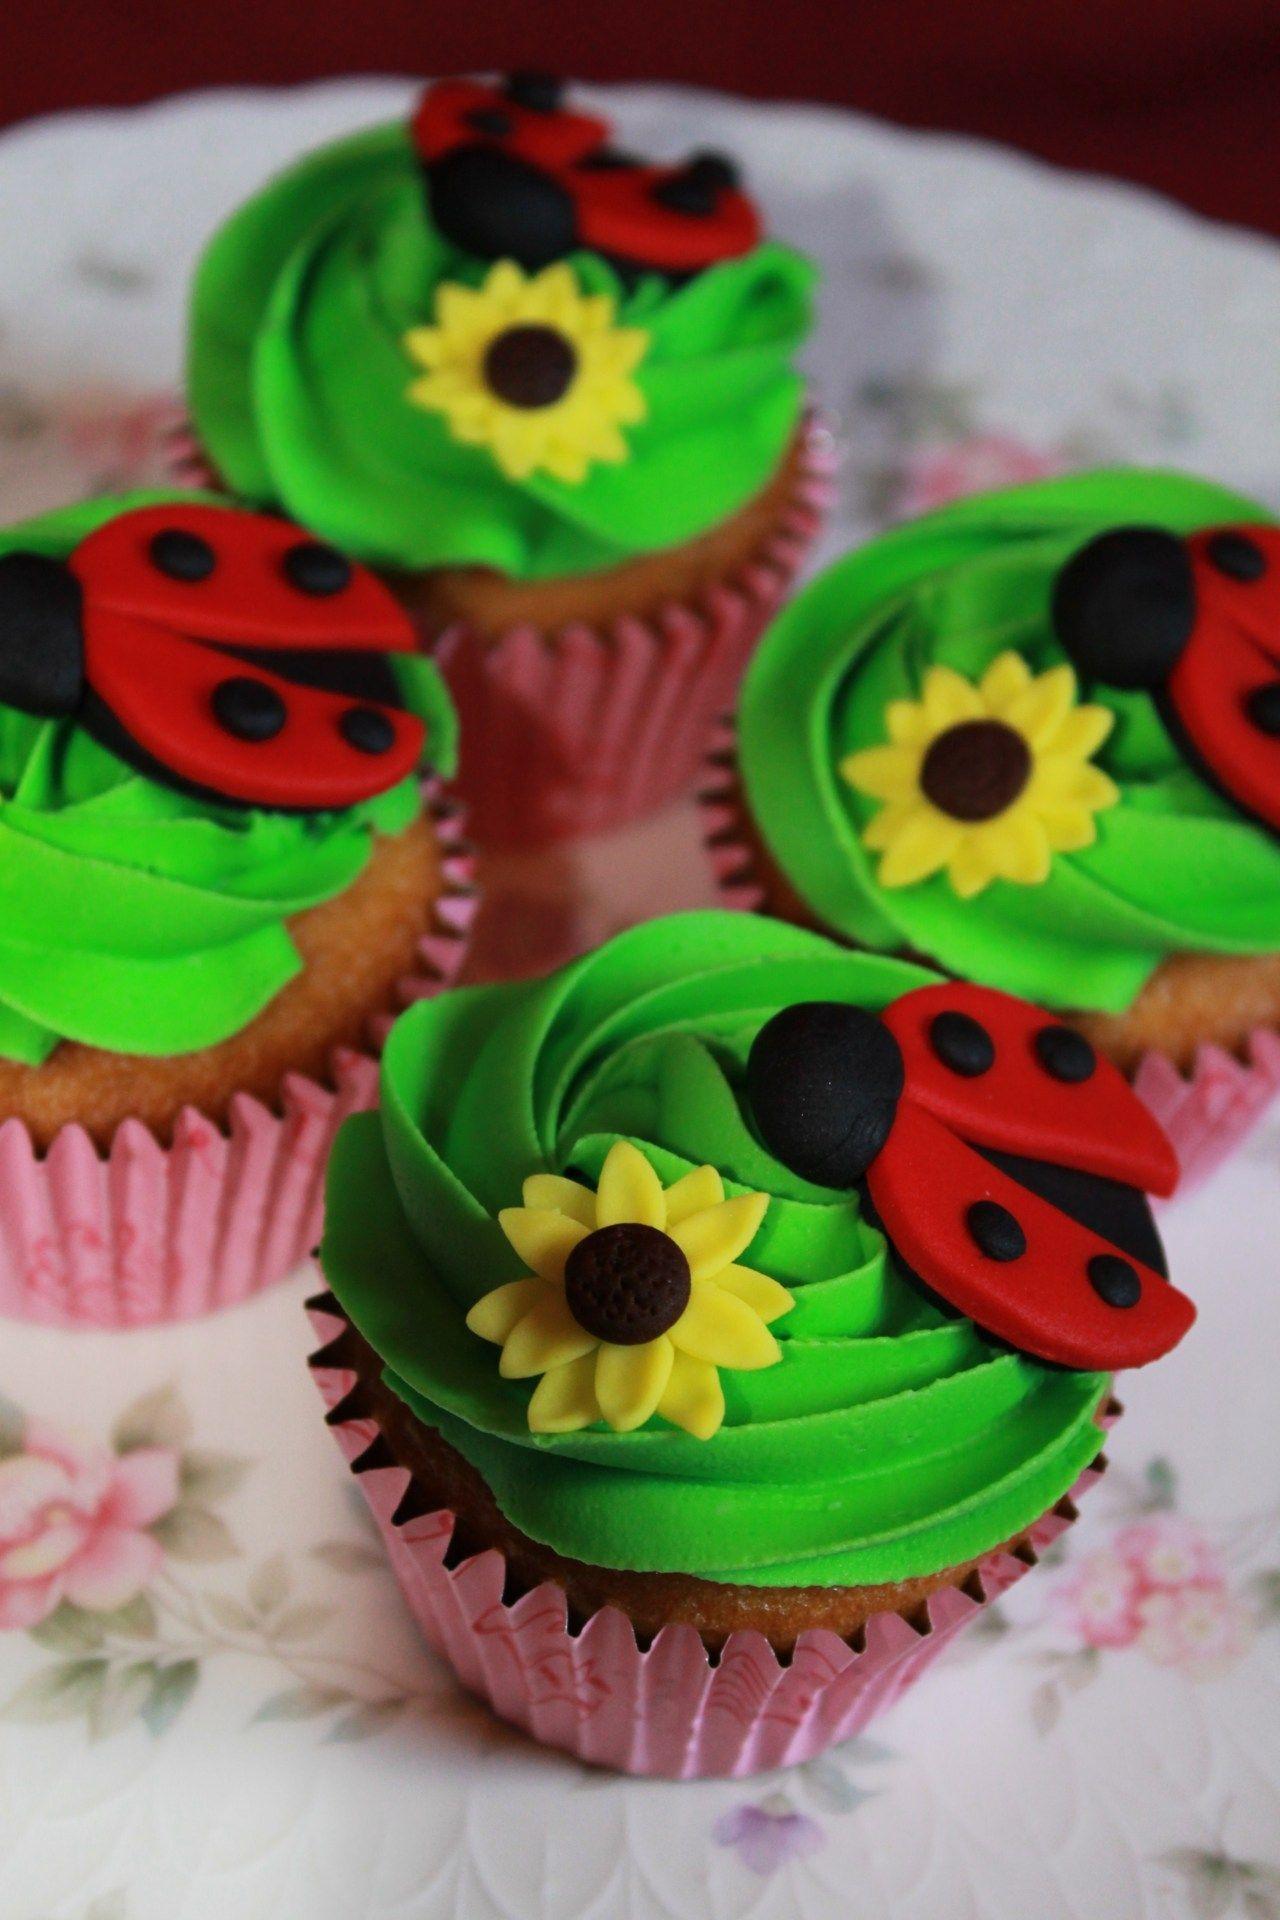 creative cupcakes f r den fall das die deko ideen mal ausgehen backen pinterest. Black Bedroom Furniture Sets. Home Design Ideas